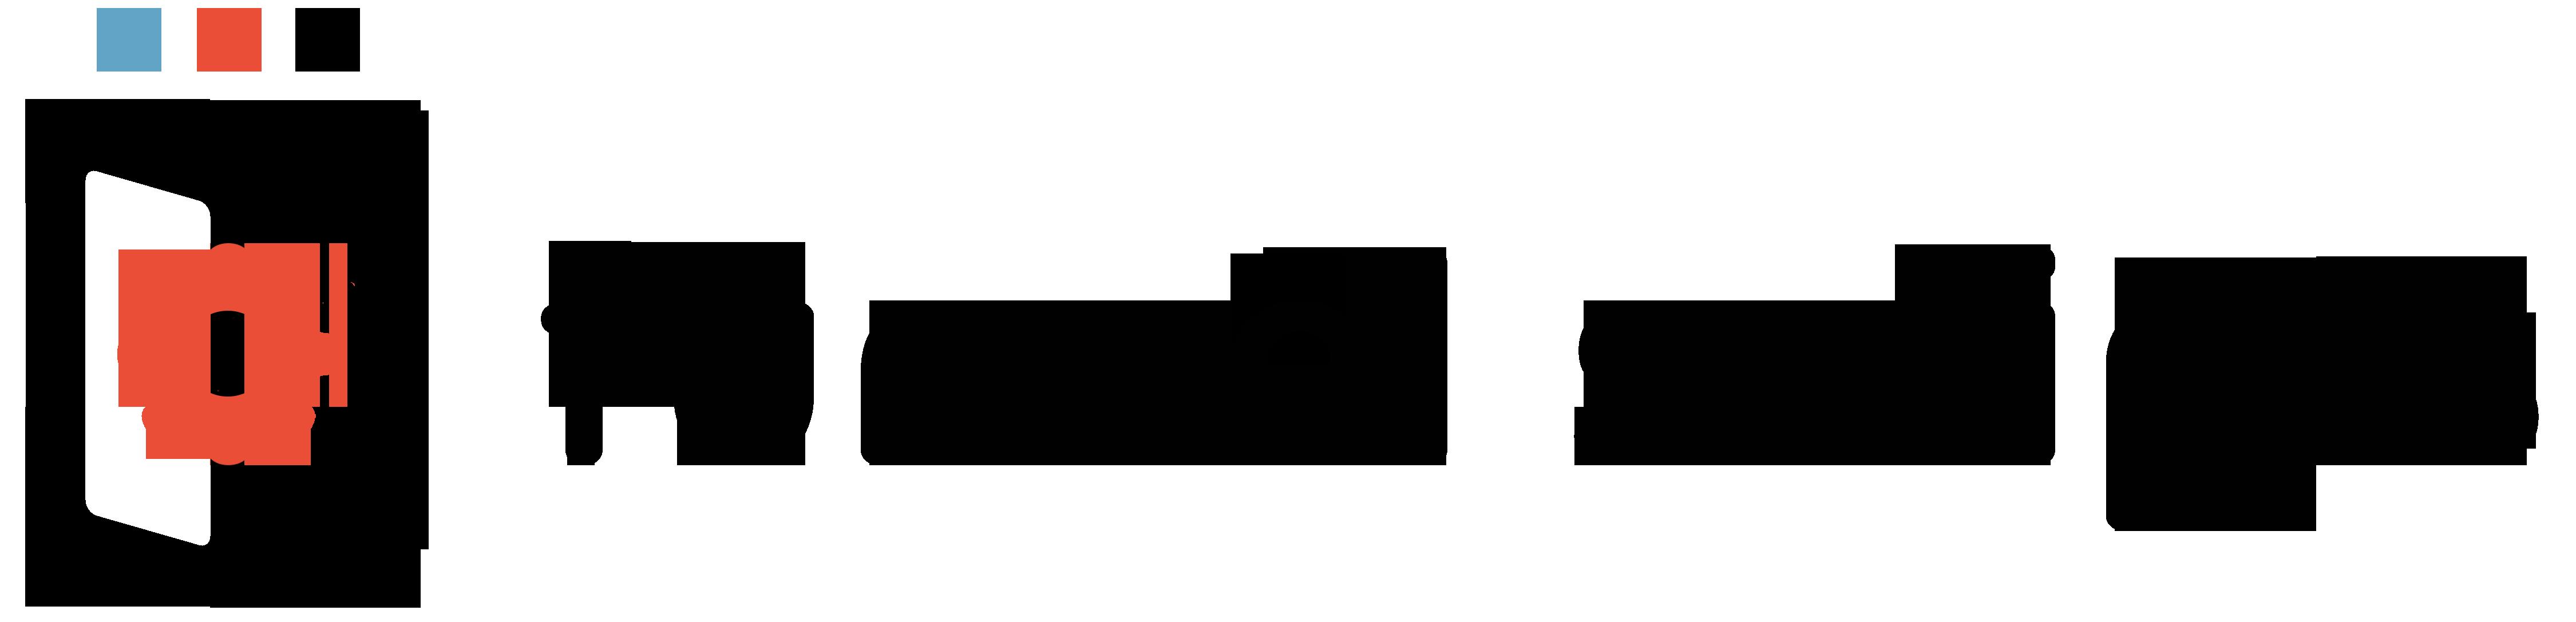 amazon lightning deals pc repair january 2018 brian